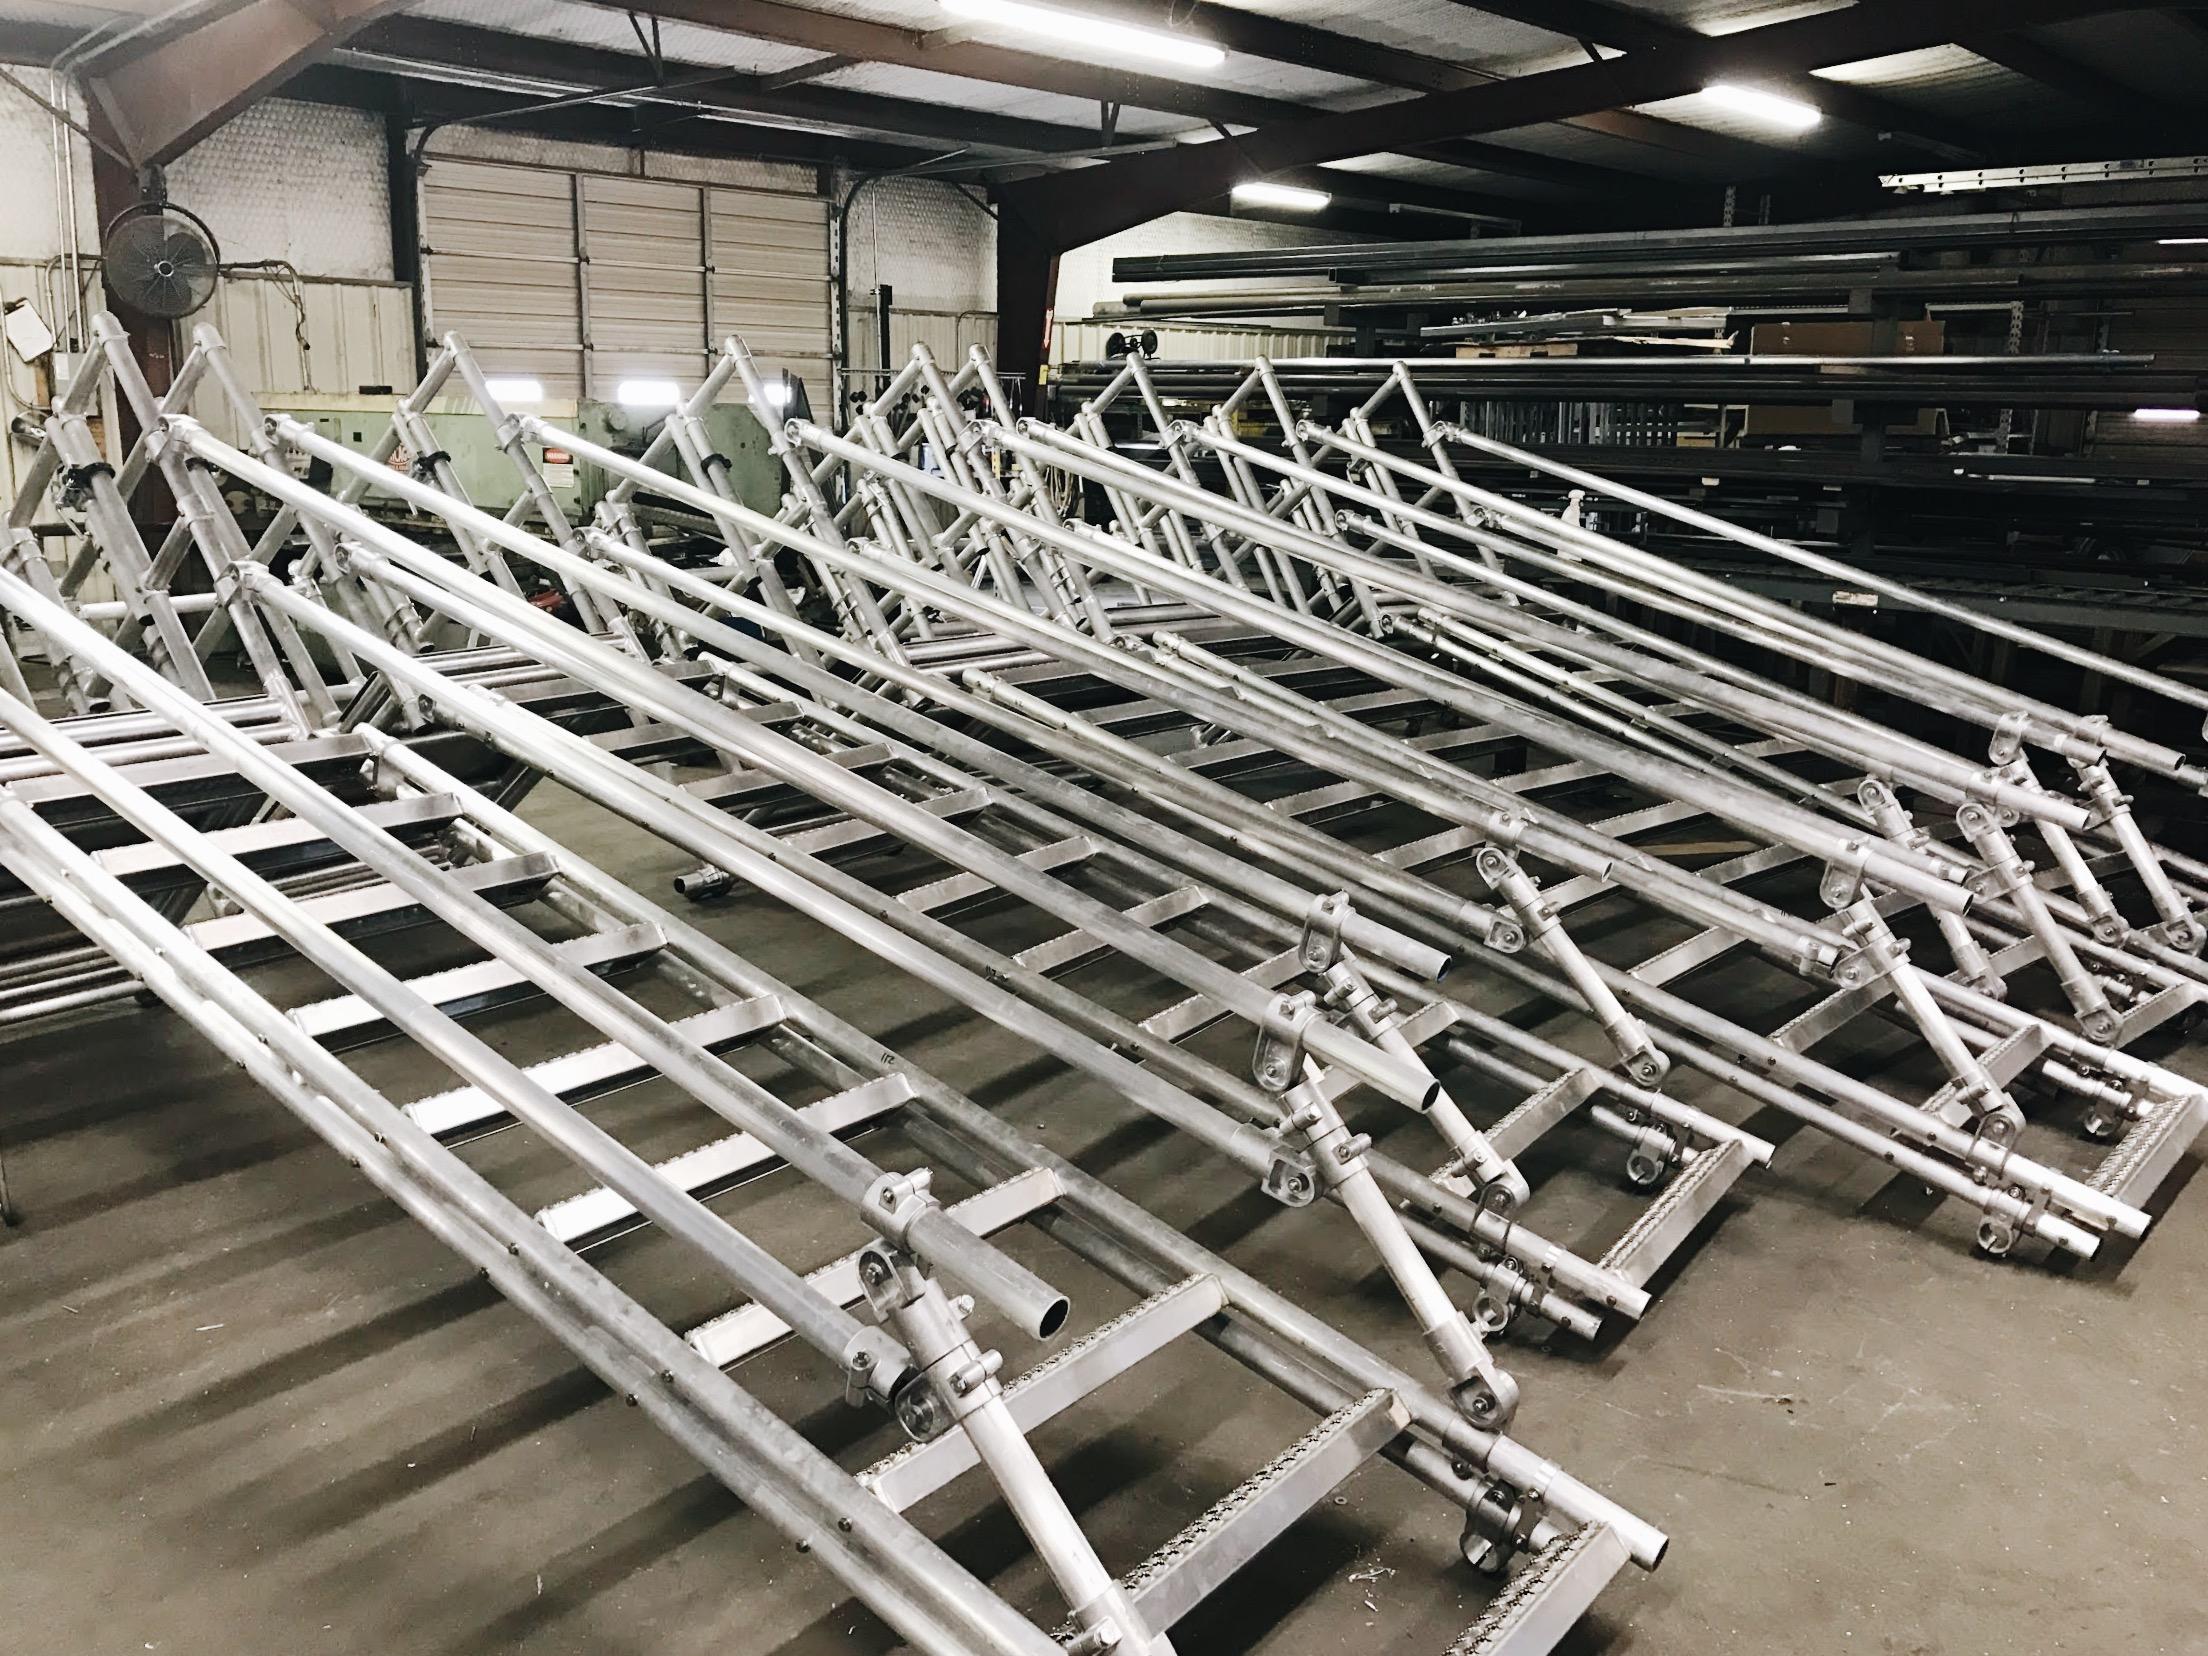 fabrication texas industrial machine & design 6.jpg